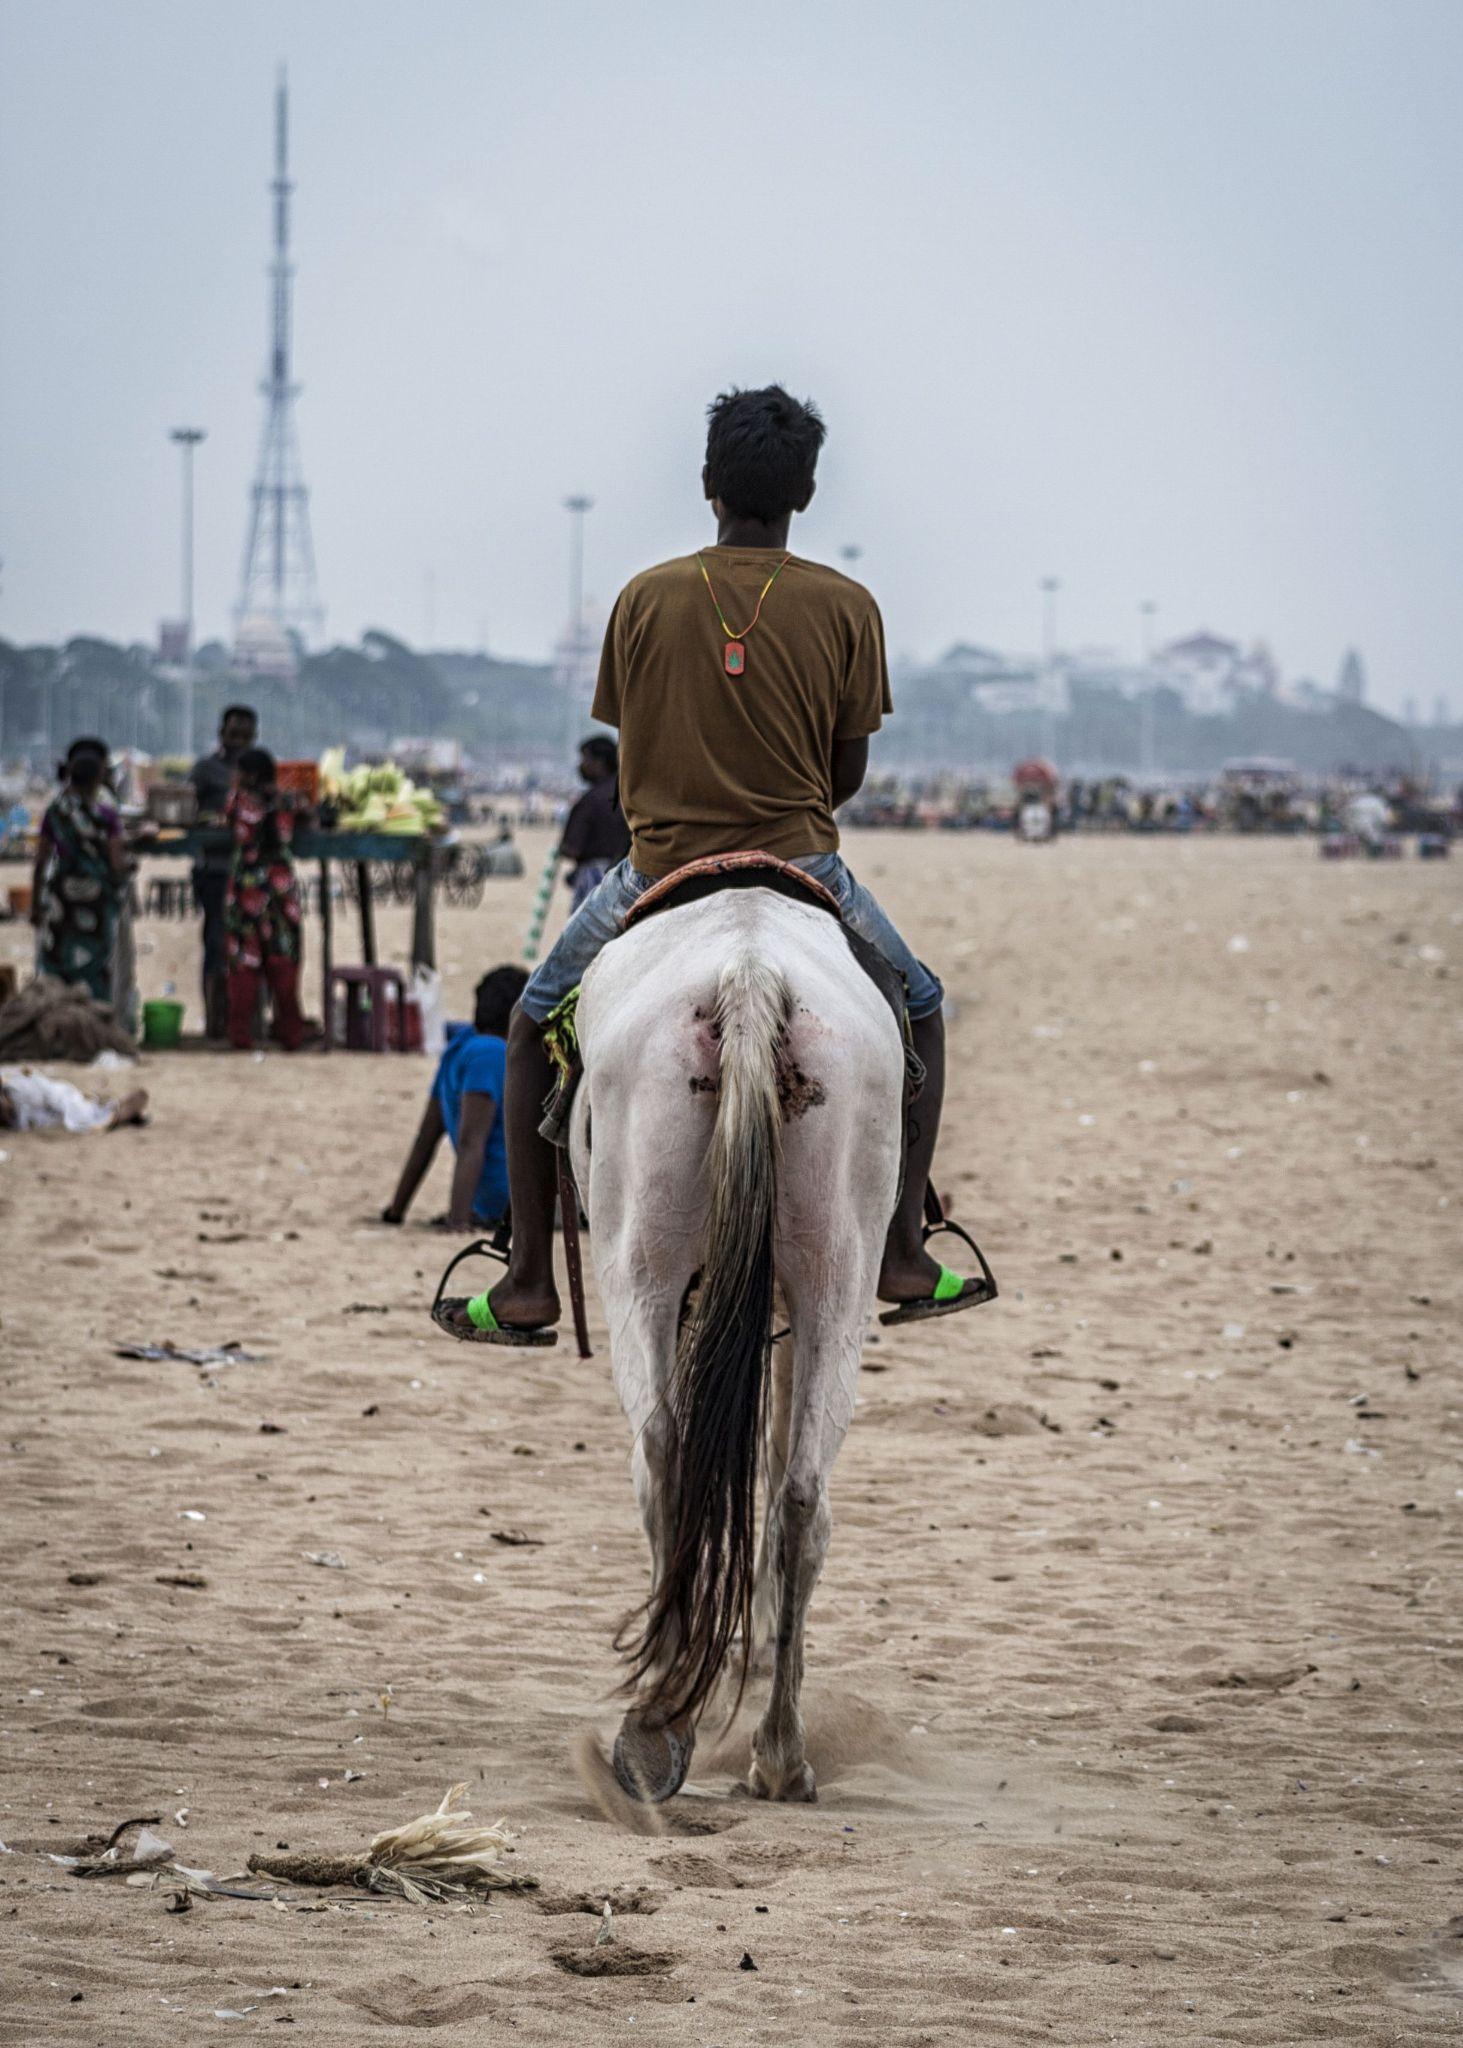 The Ride Back by Vikram Seshadri